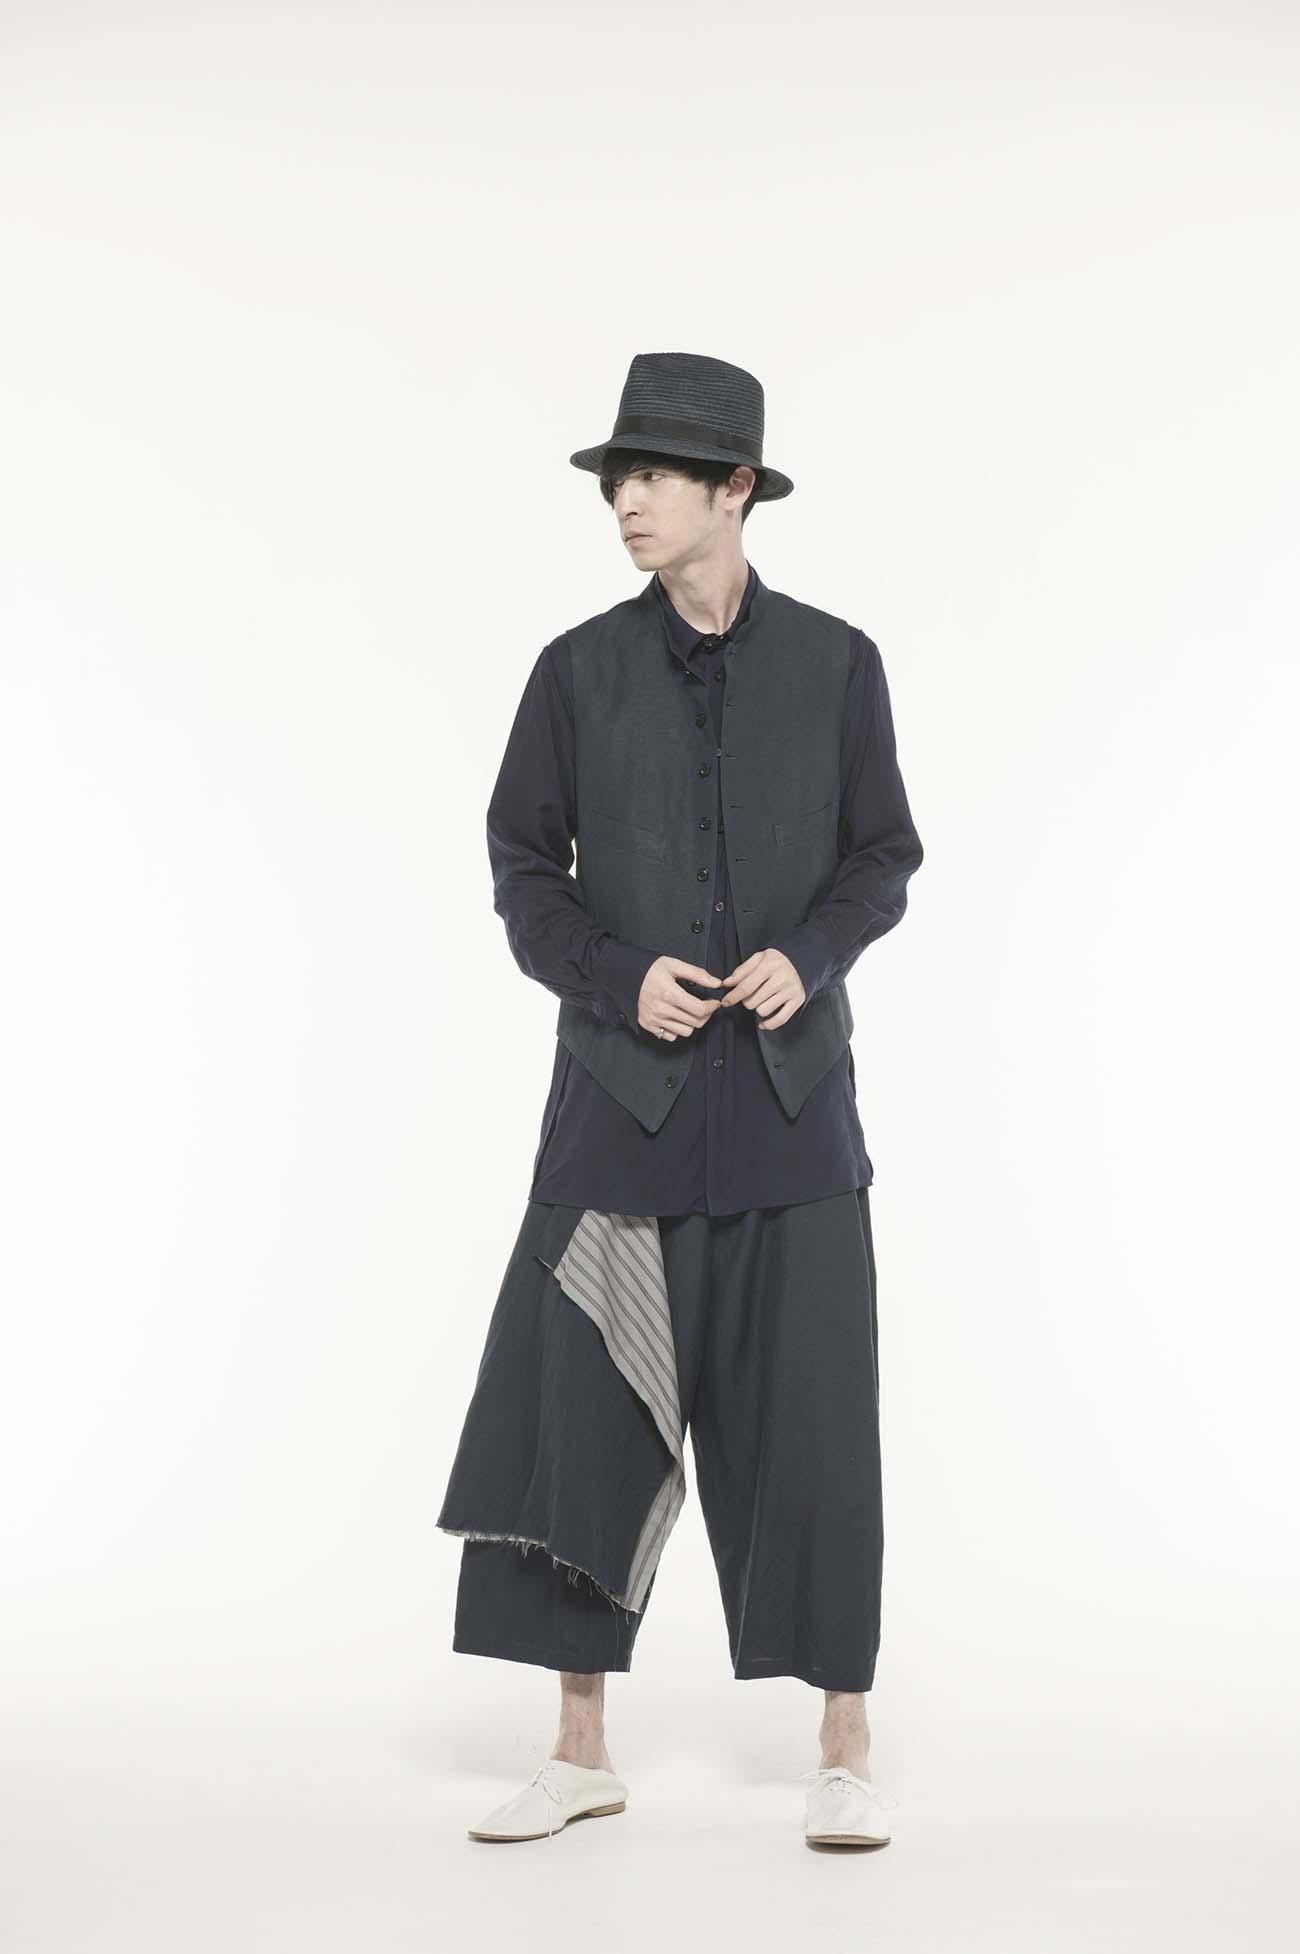 Rayon/Linen Bio Washer Stand Collar Vest